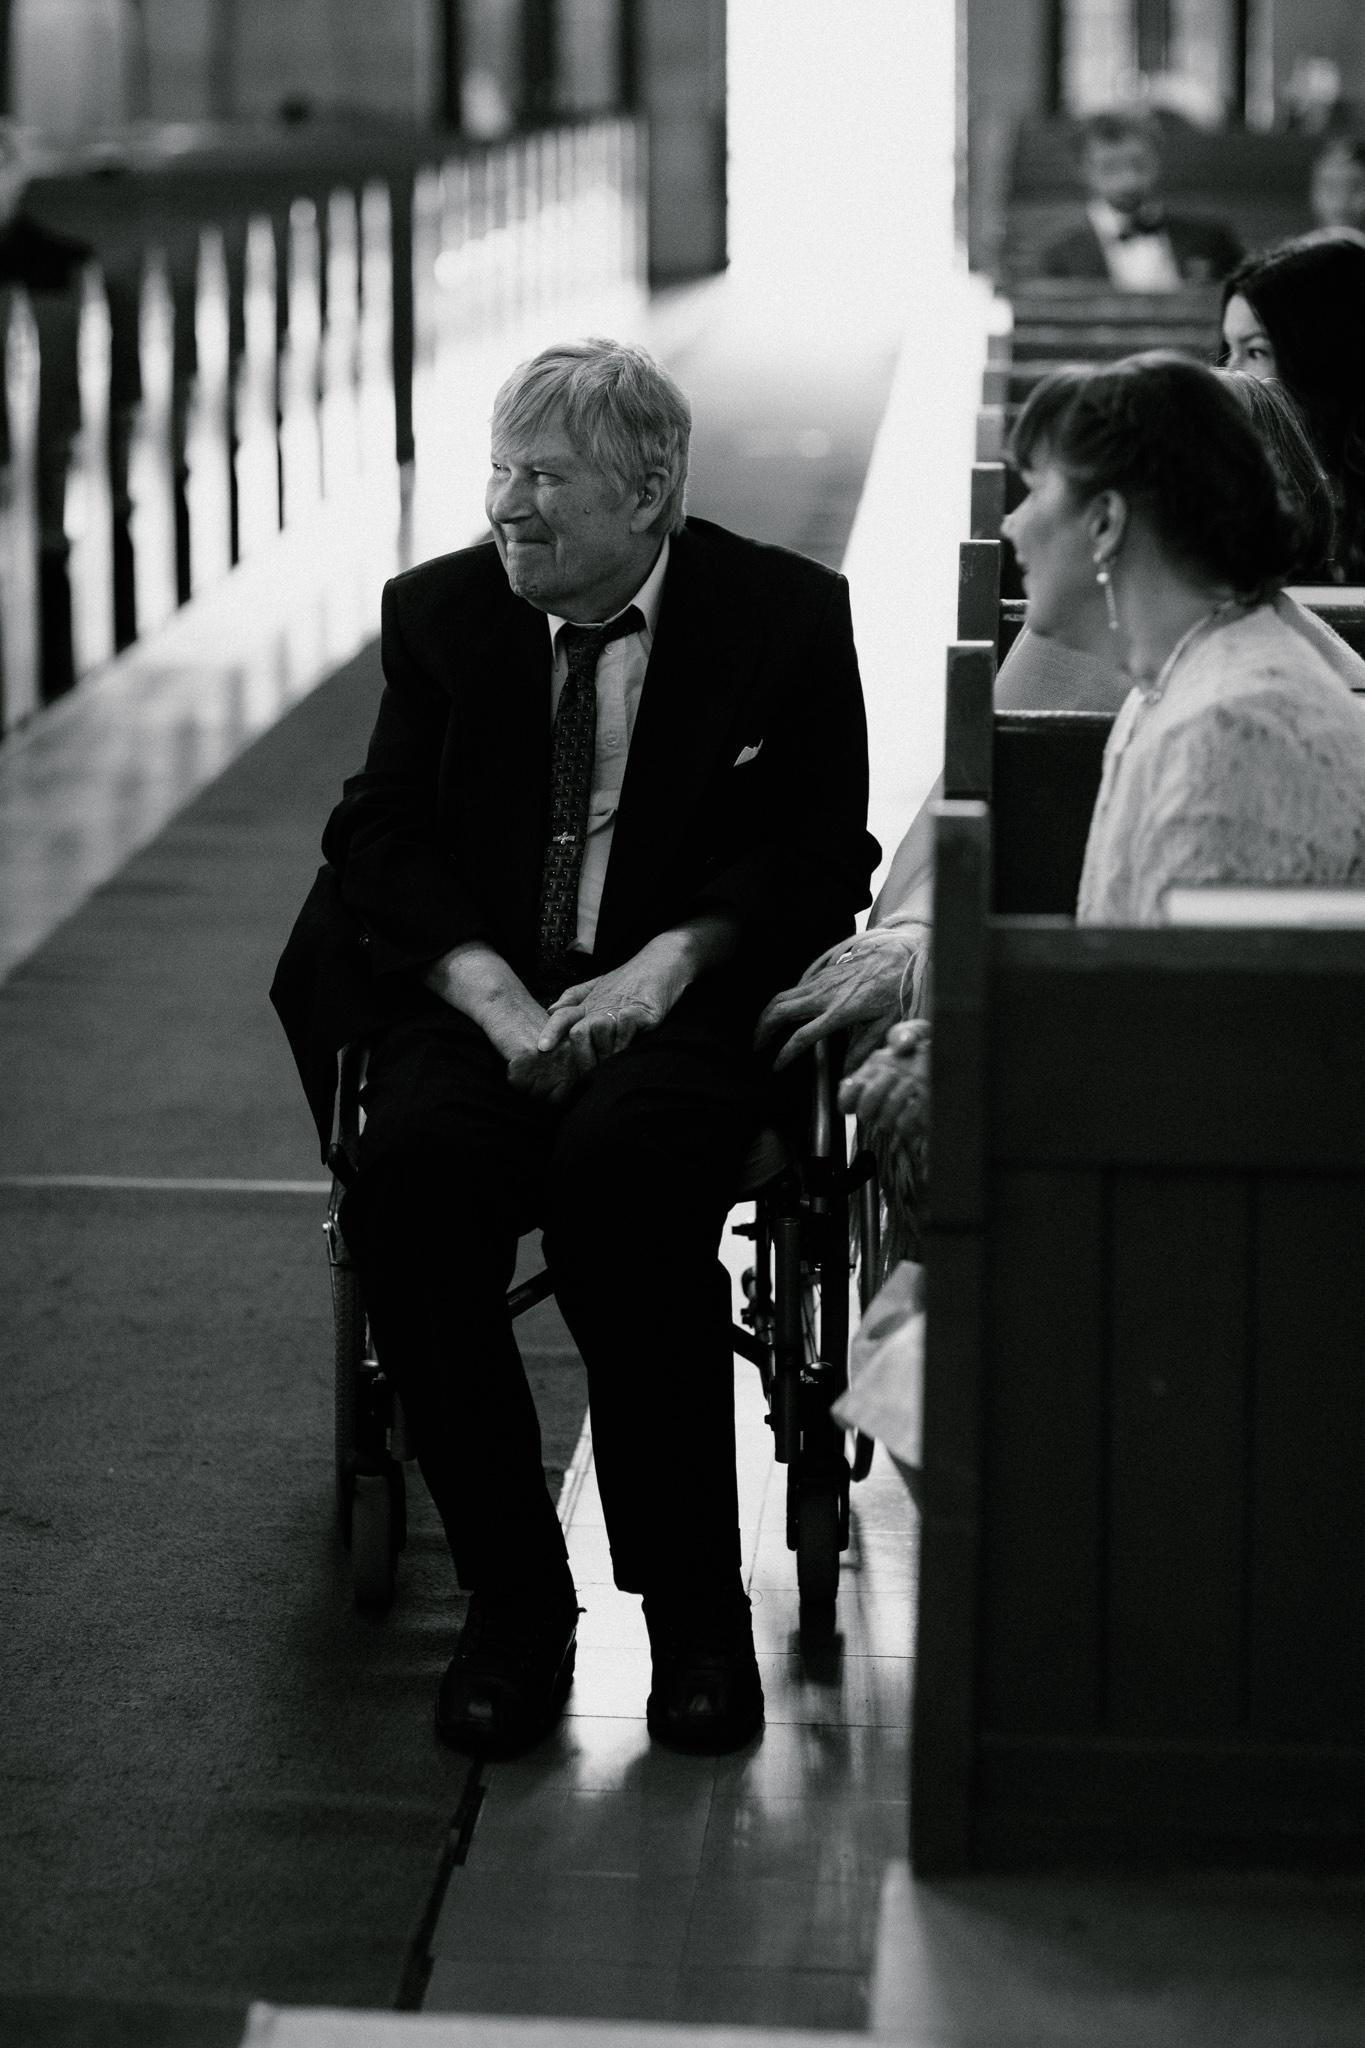 Johanna + Mikko - Tampere - Photo by Patrick Karkkolainen Wedding Photographer-57.jpg